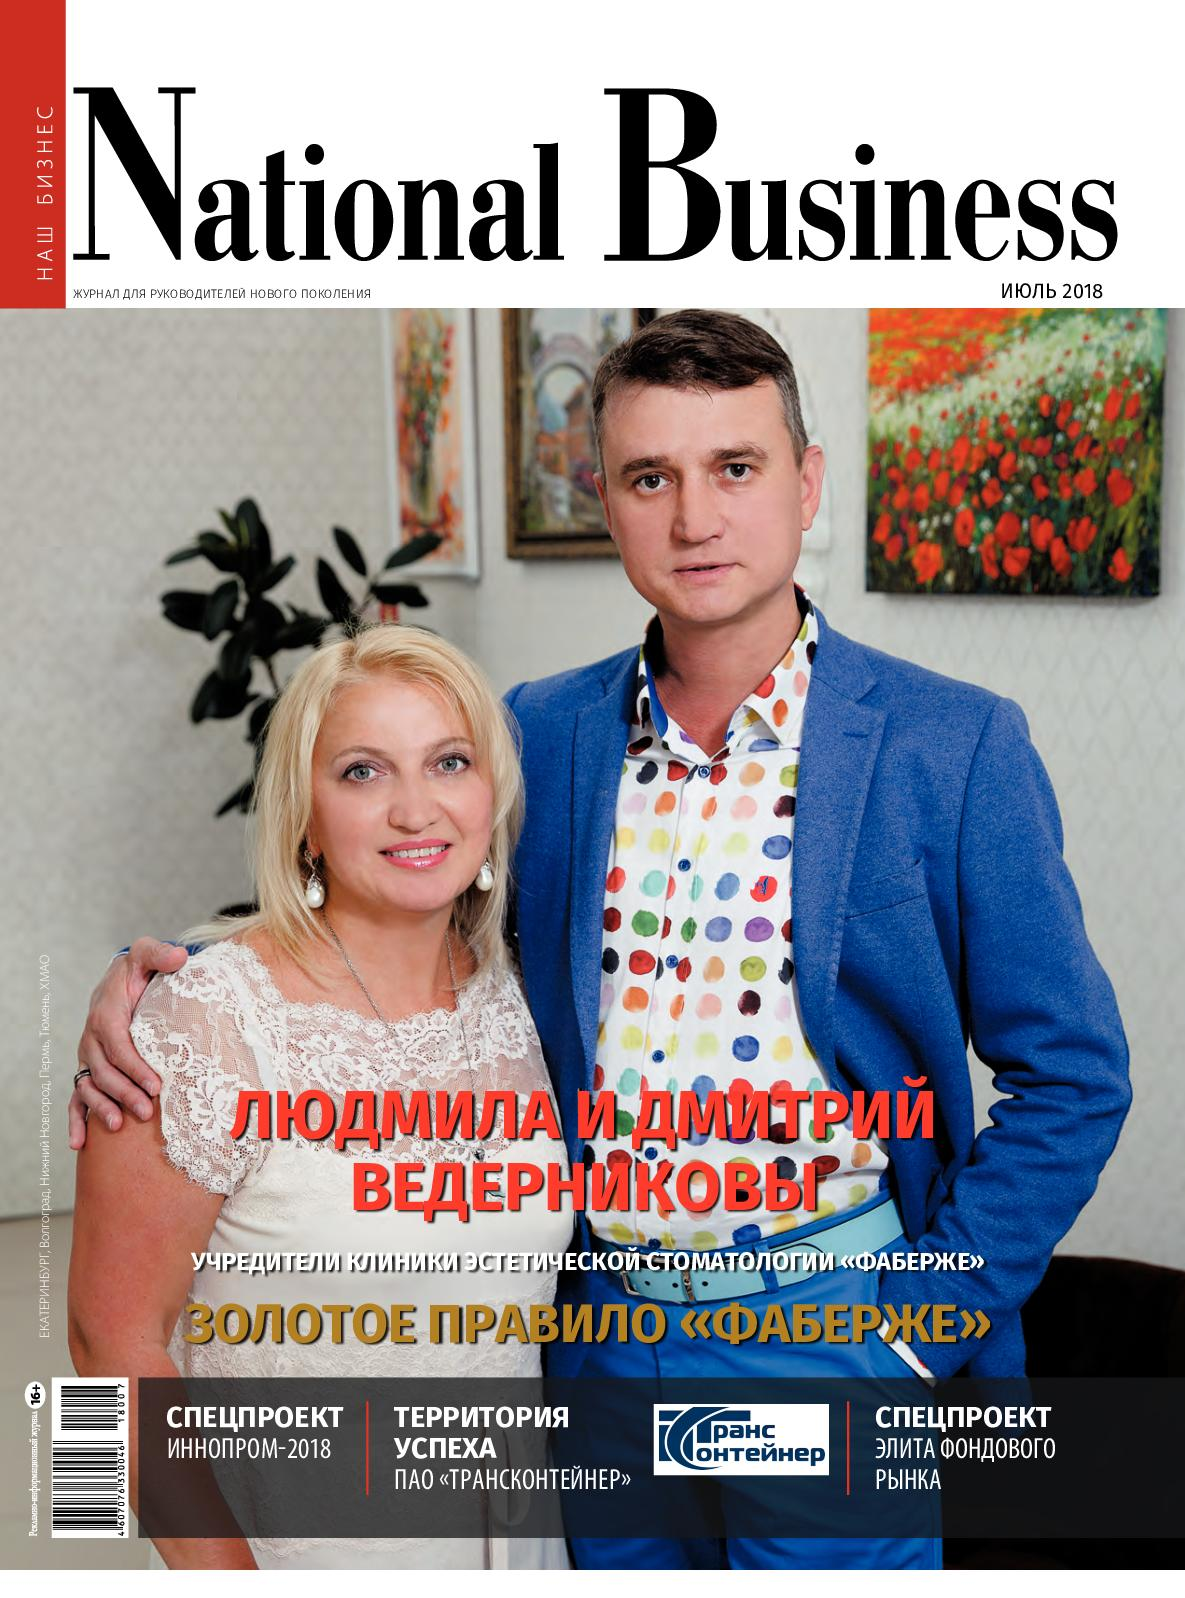 df929fa85 Calaméo - National Business Екатеринбург июль 2018